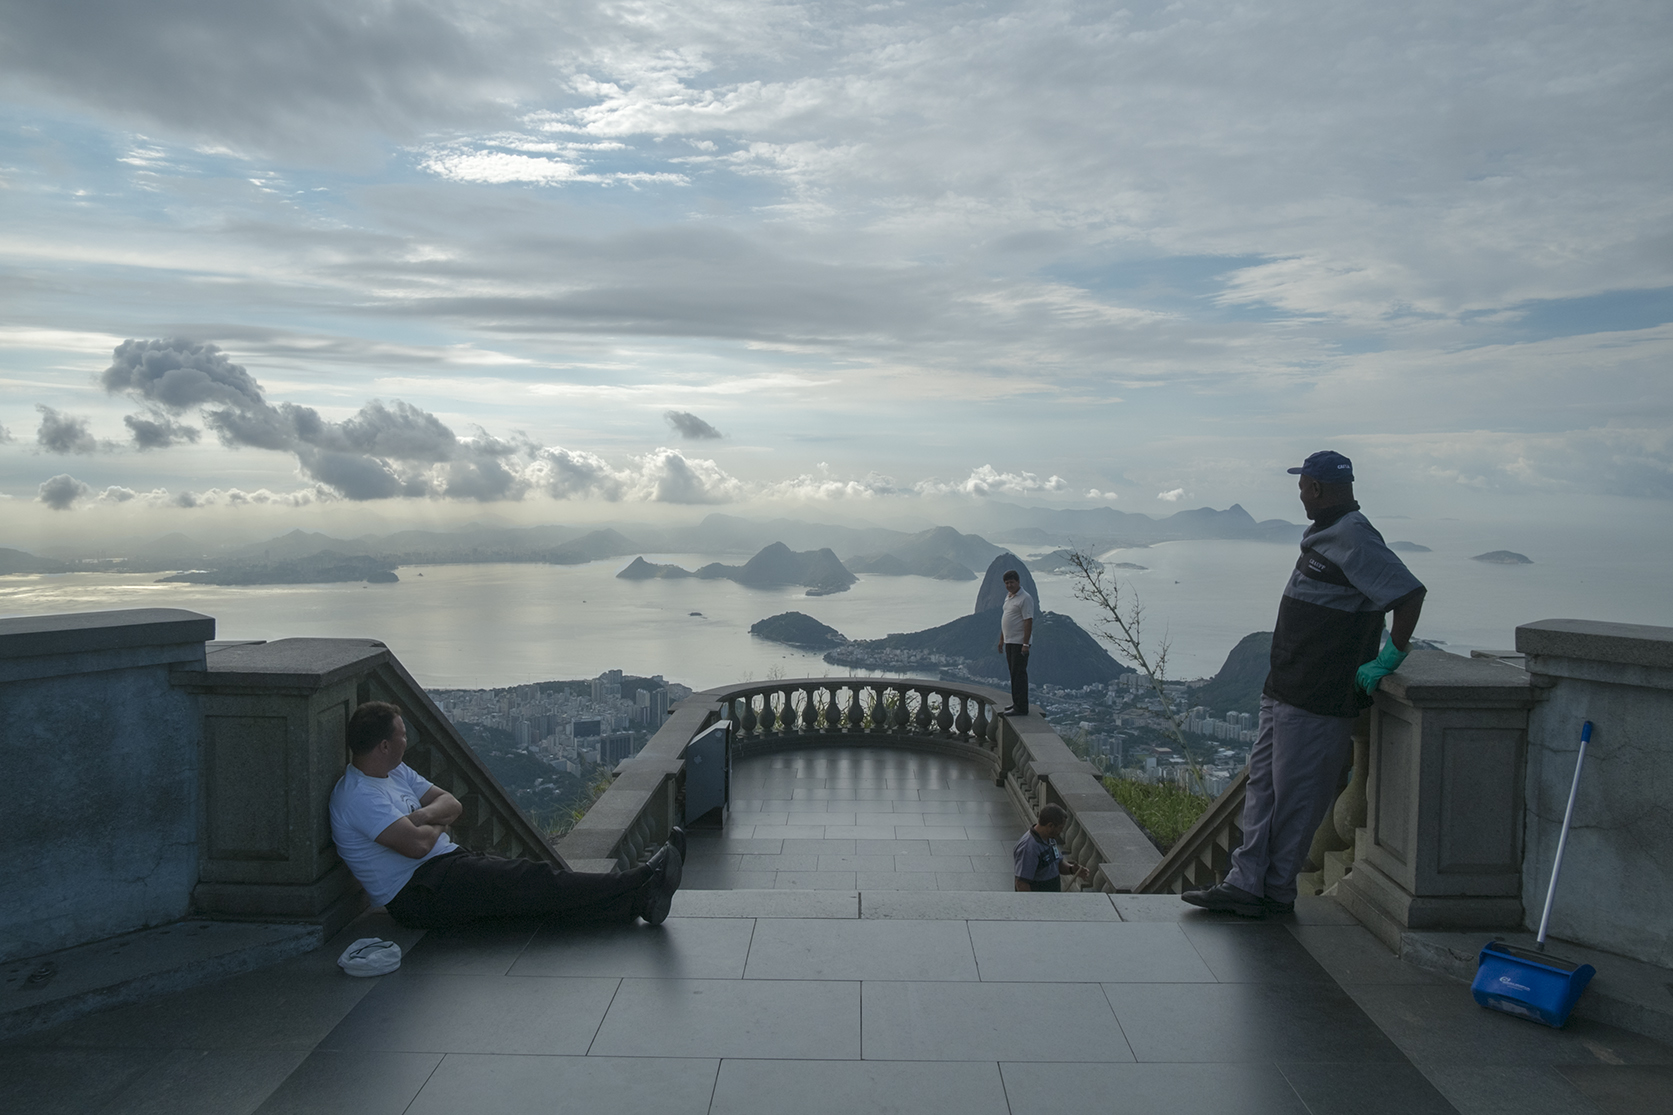 Christ the redeemer, Rio de Janeiro|©Oliver Curtis/Chloe Nelkin Consulting